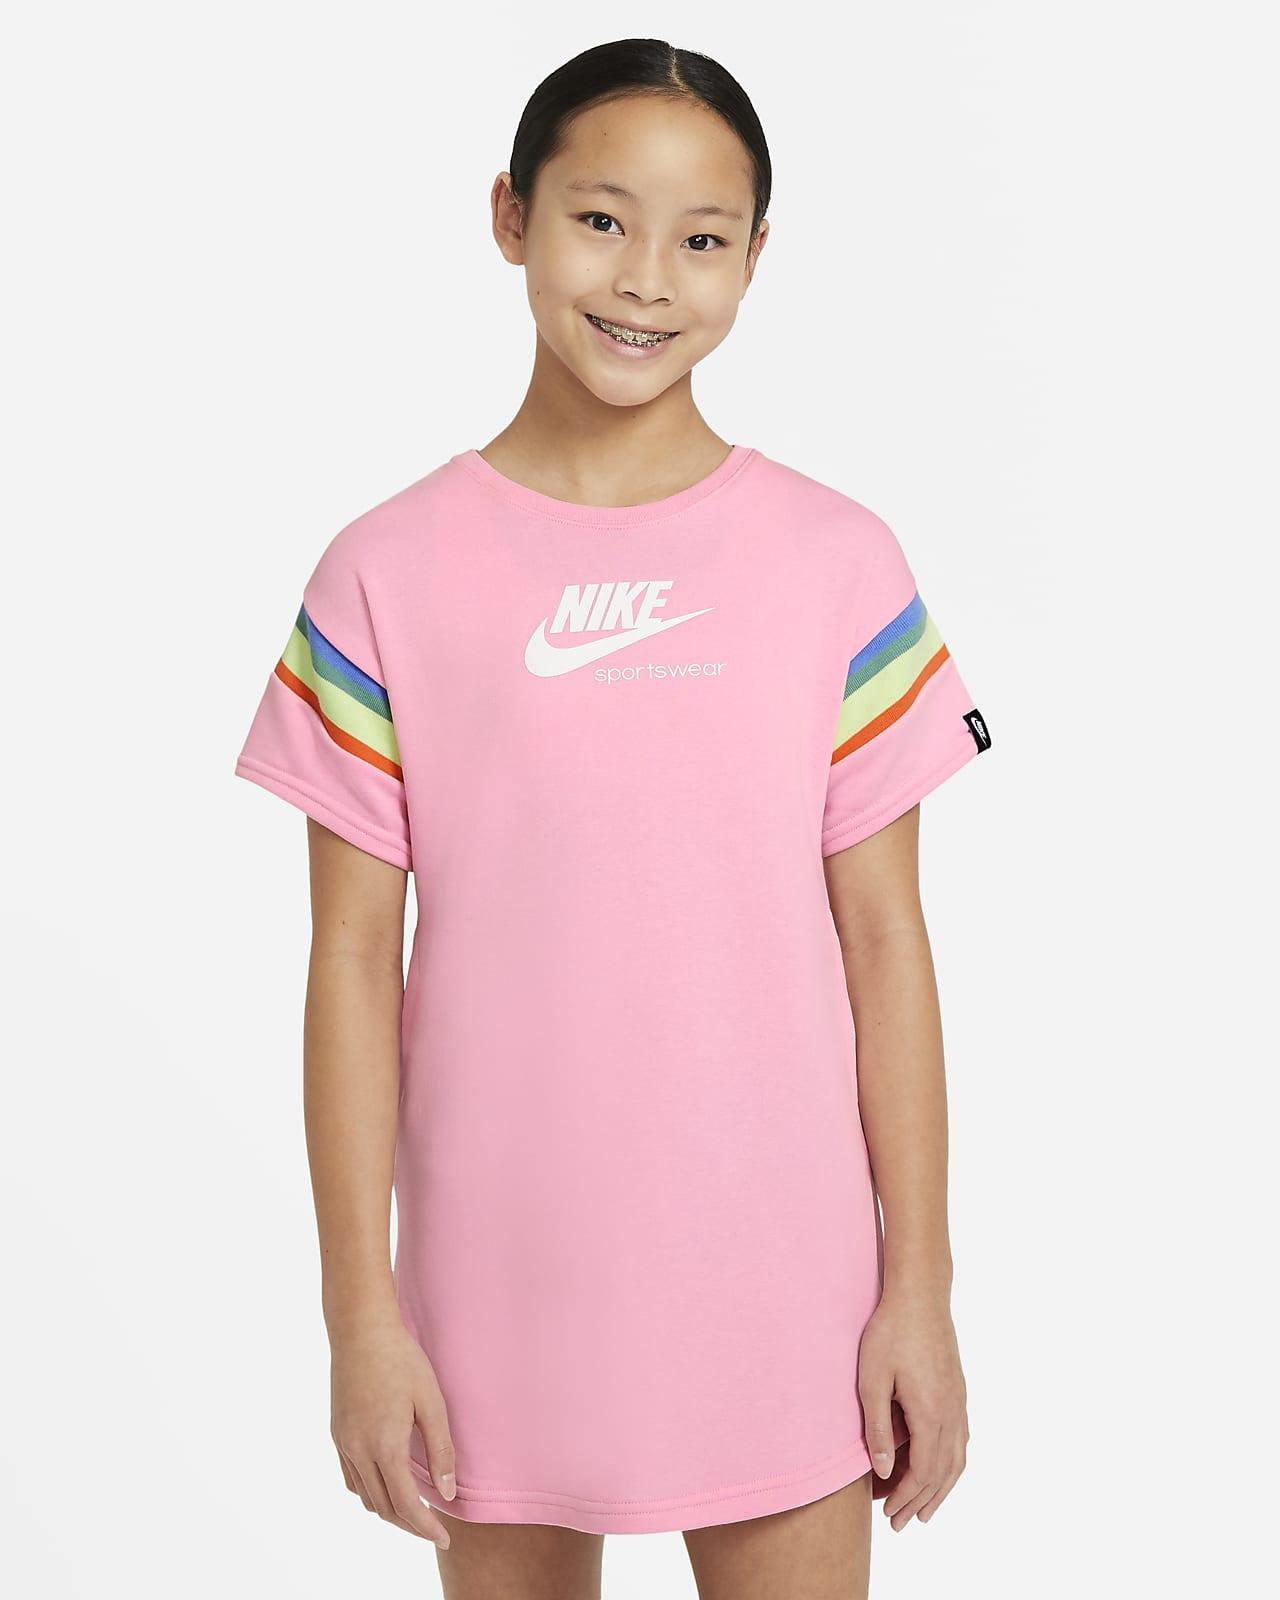 Nike Sportswear Heritage rövid ujjú ruha nagyobb gyerekeknek (lányoknak)